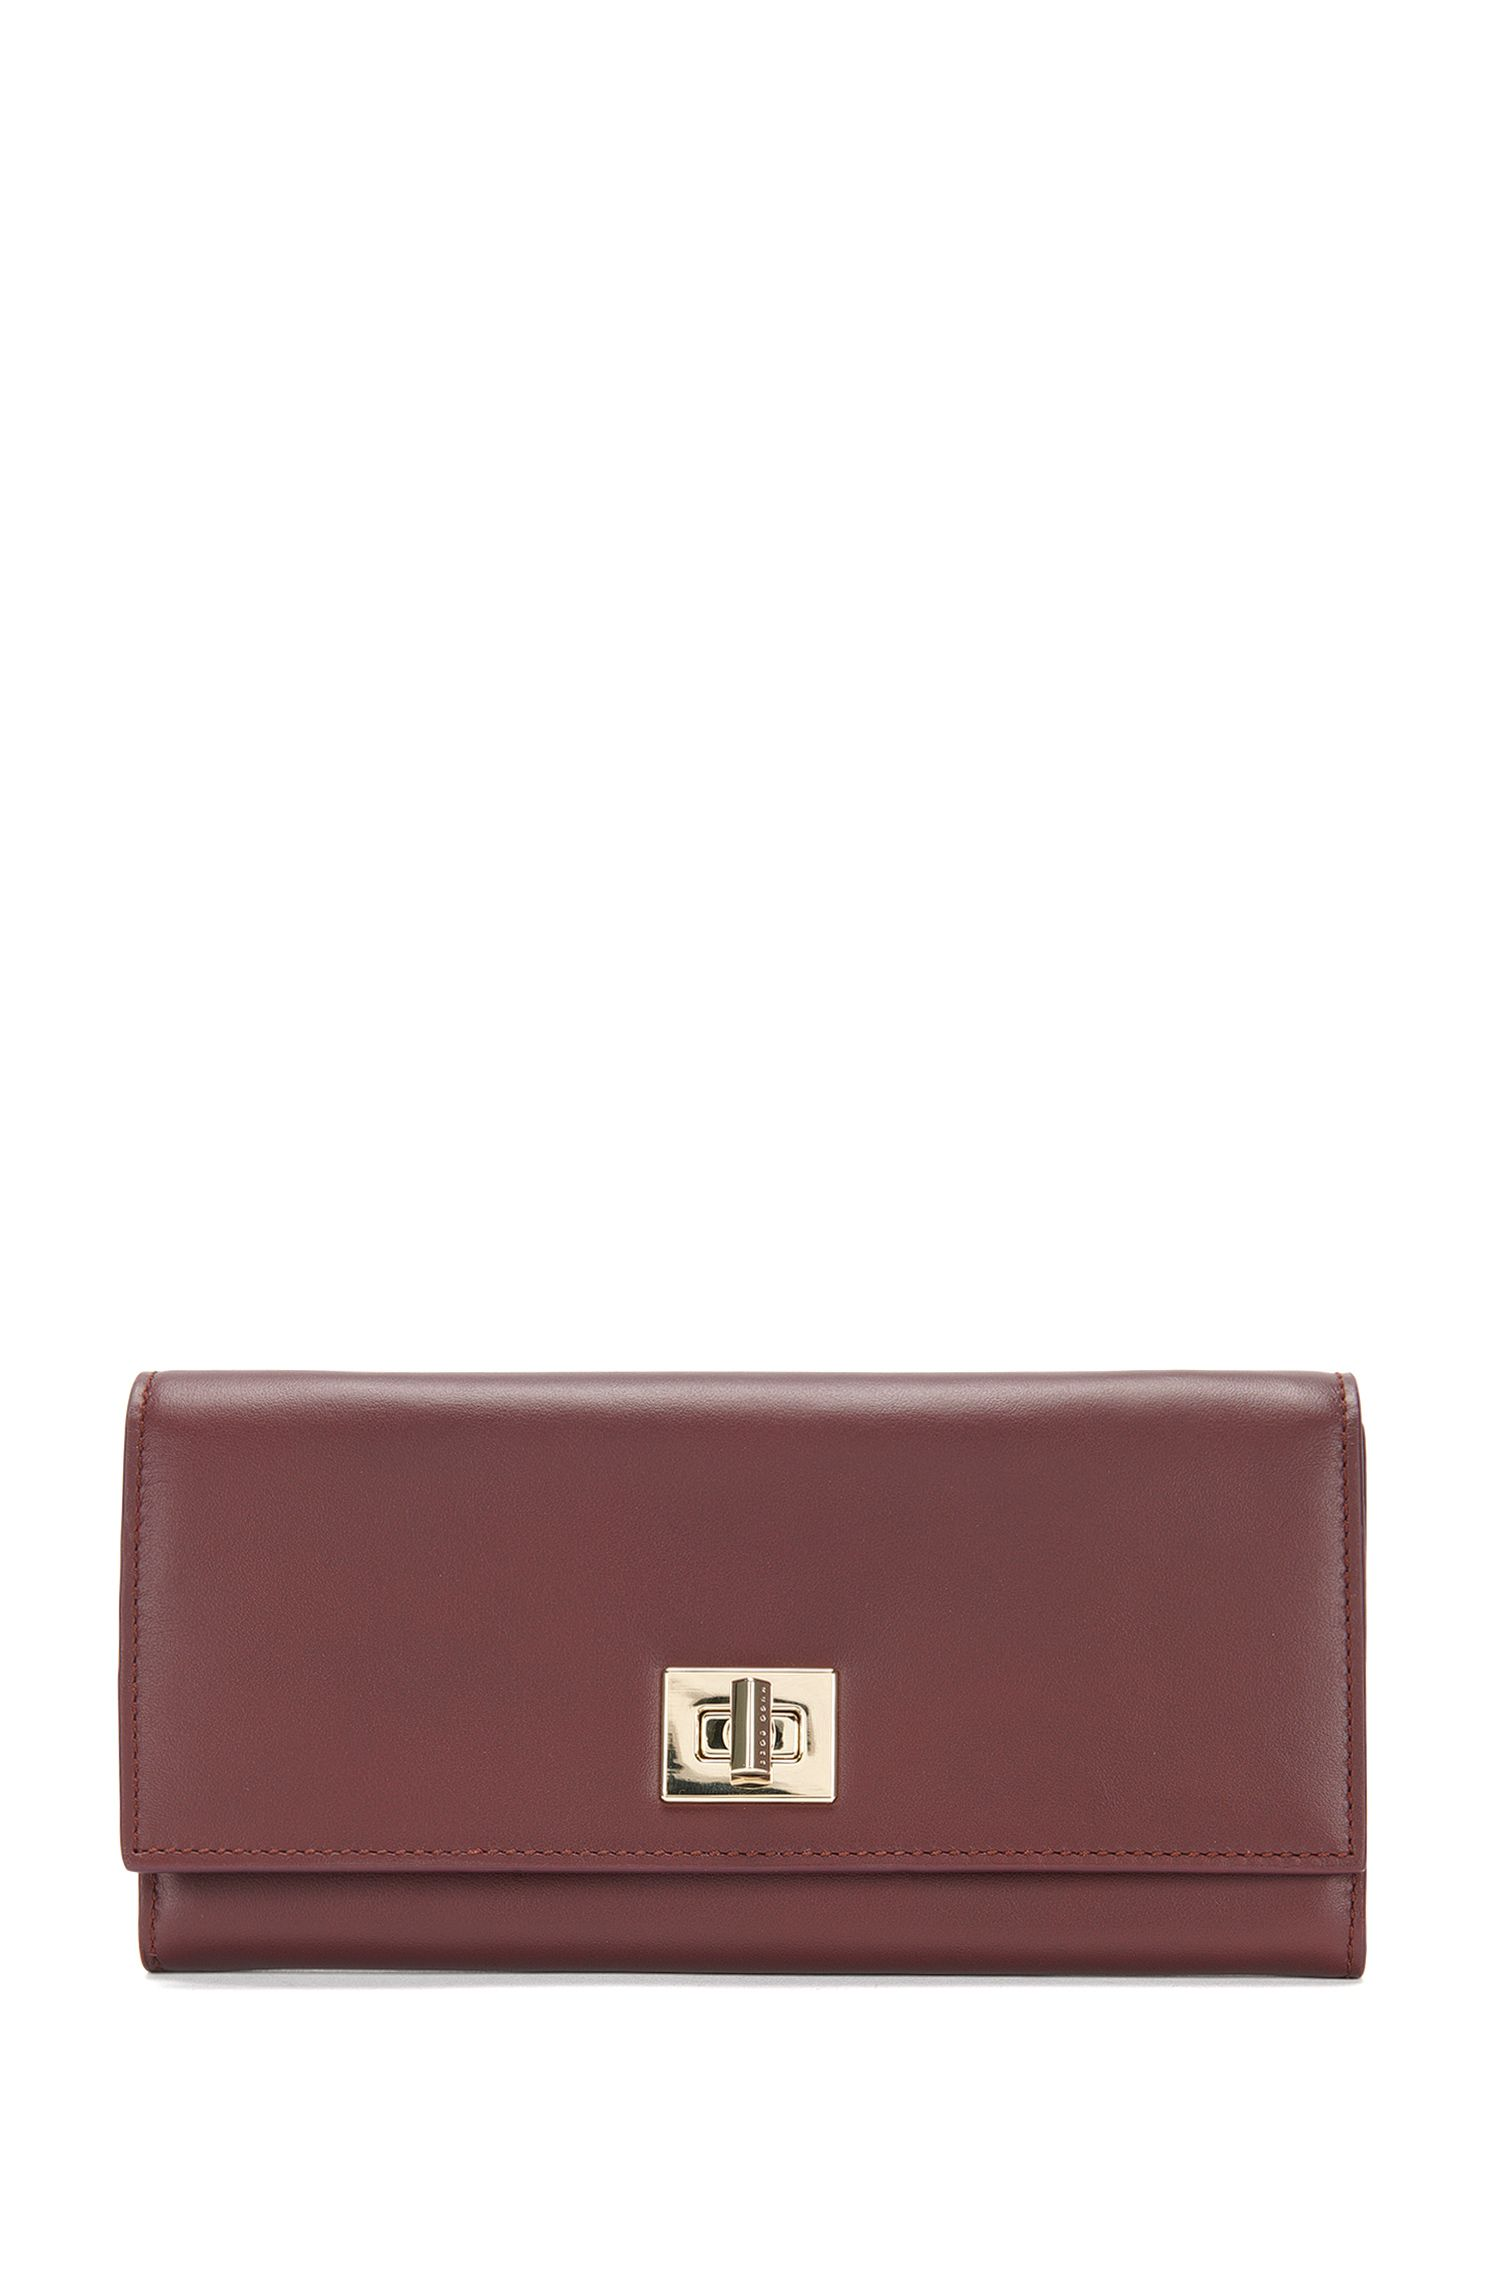 'Bespoke Cont-M' | Calfskin Clutch Wallet, Chain Strap